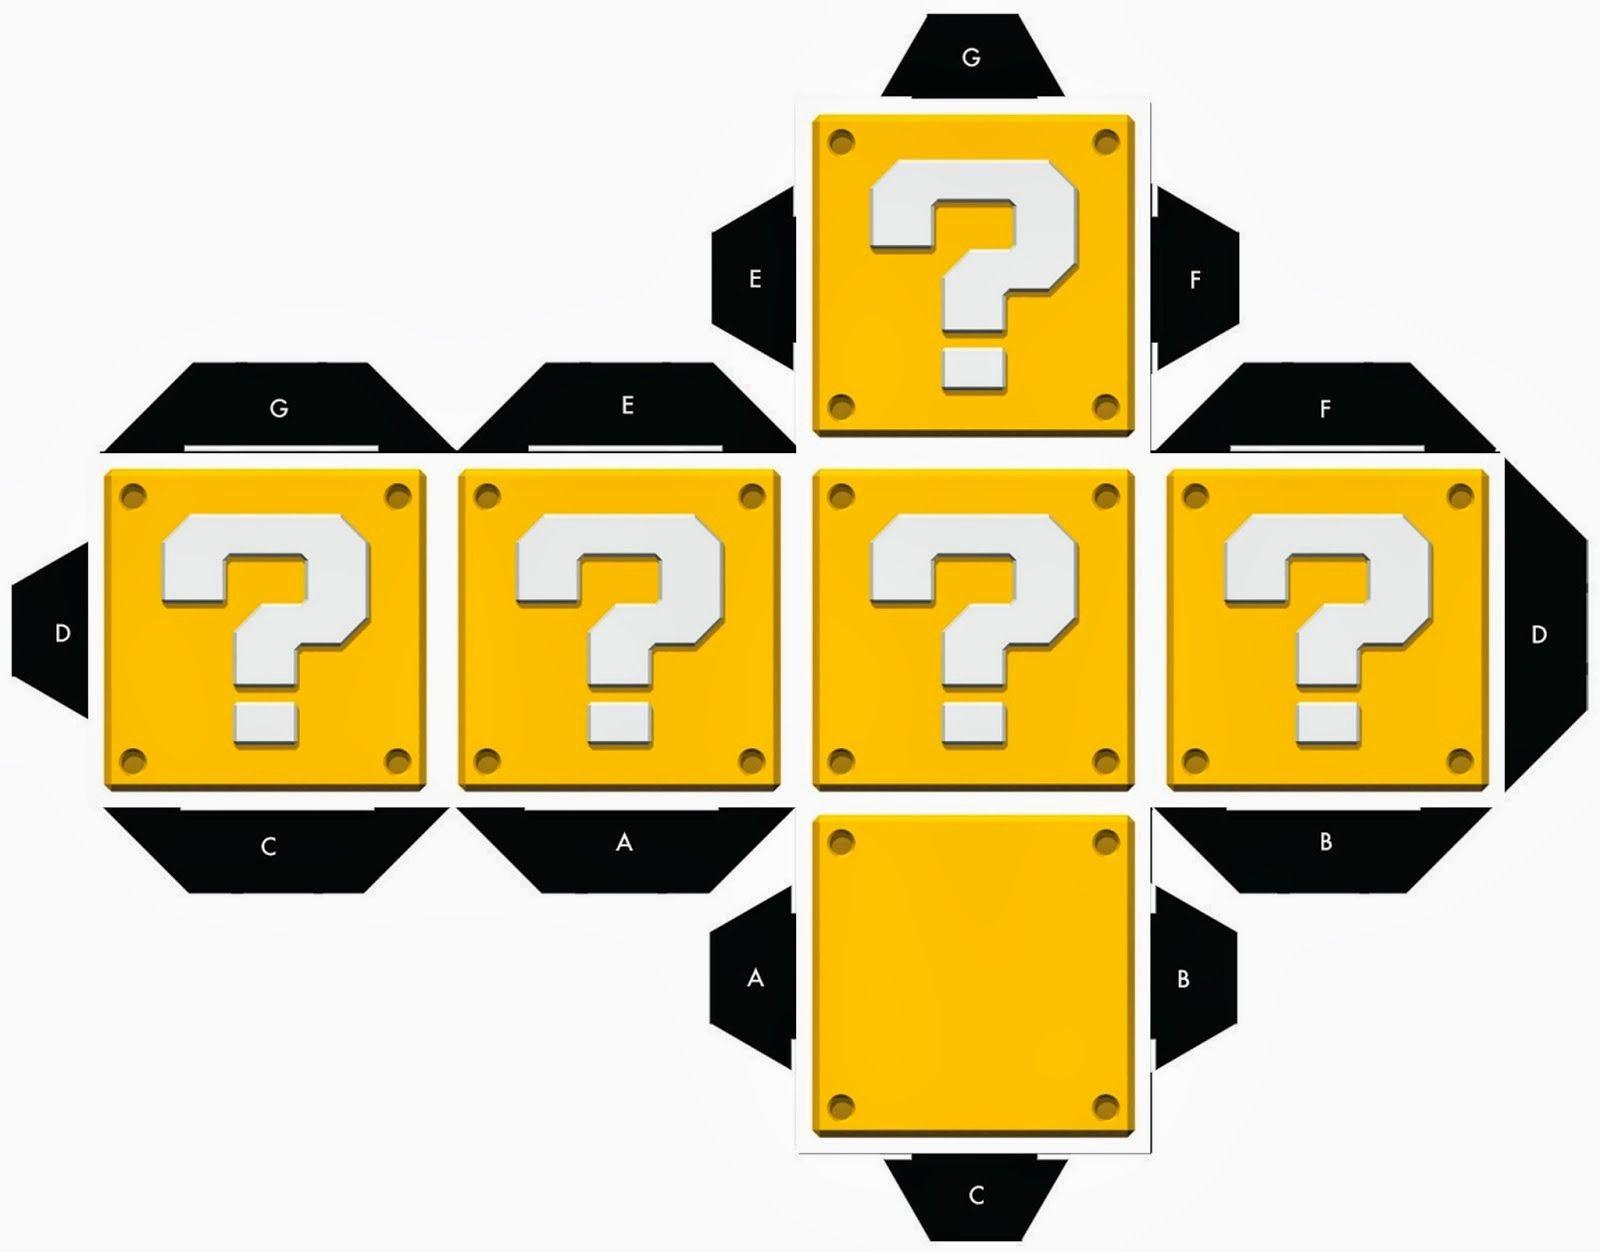 Mario Papercraft Cajas De Super Mario Bros Para Imprimir Gratis